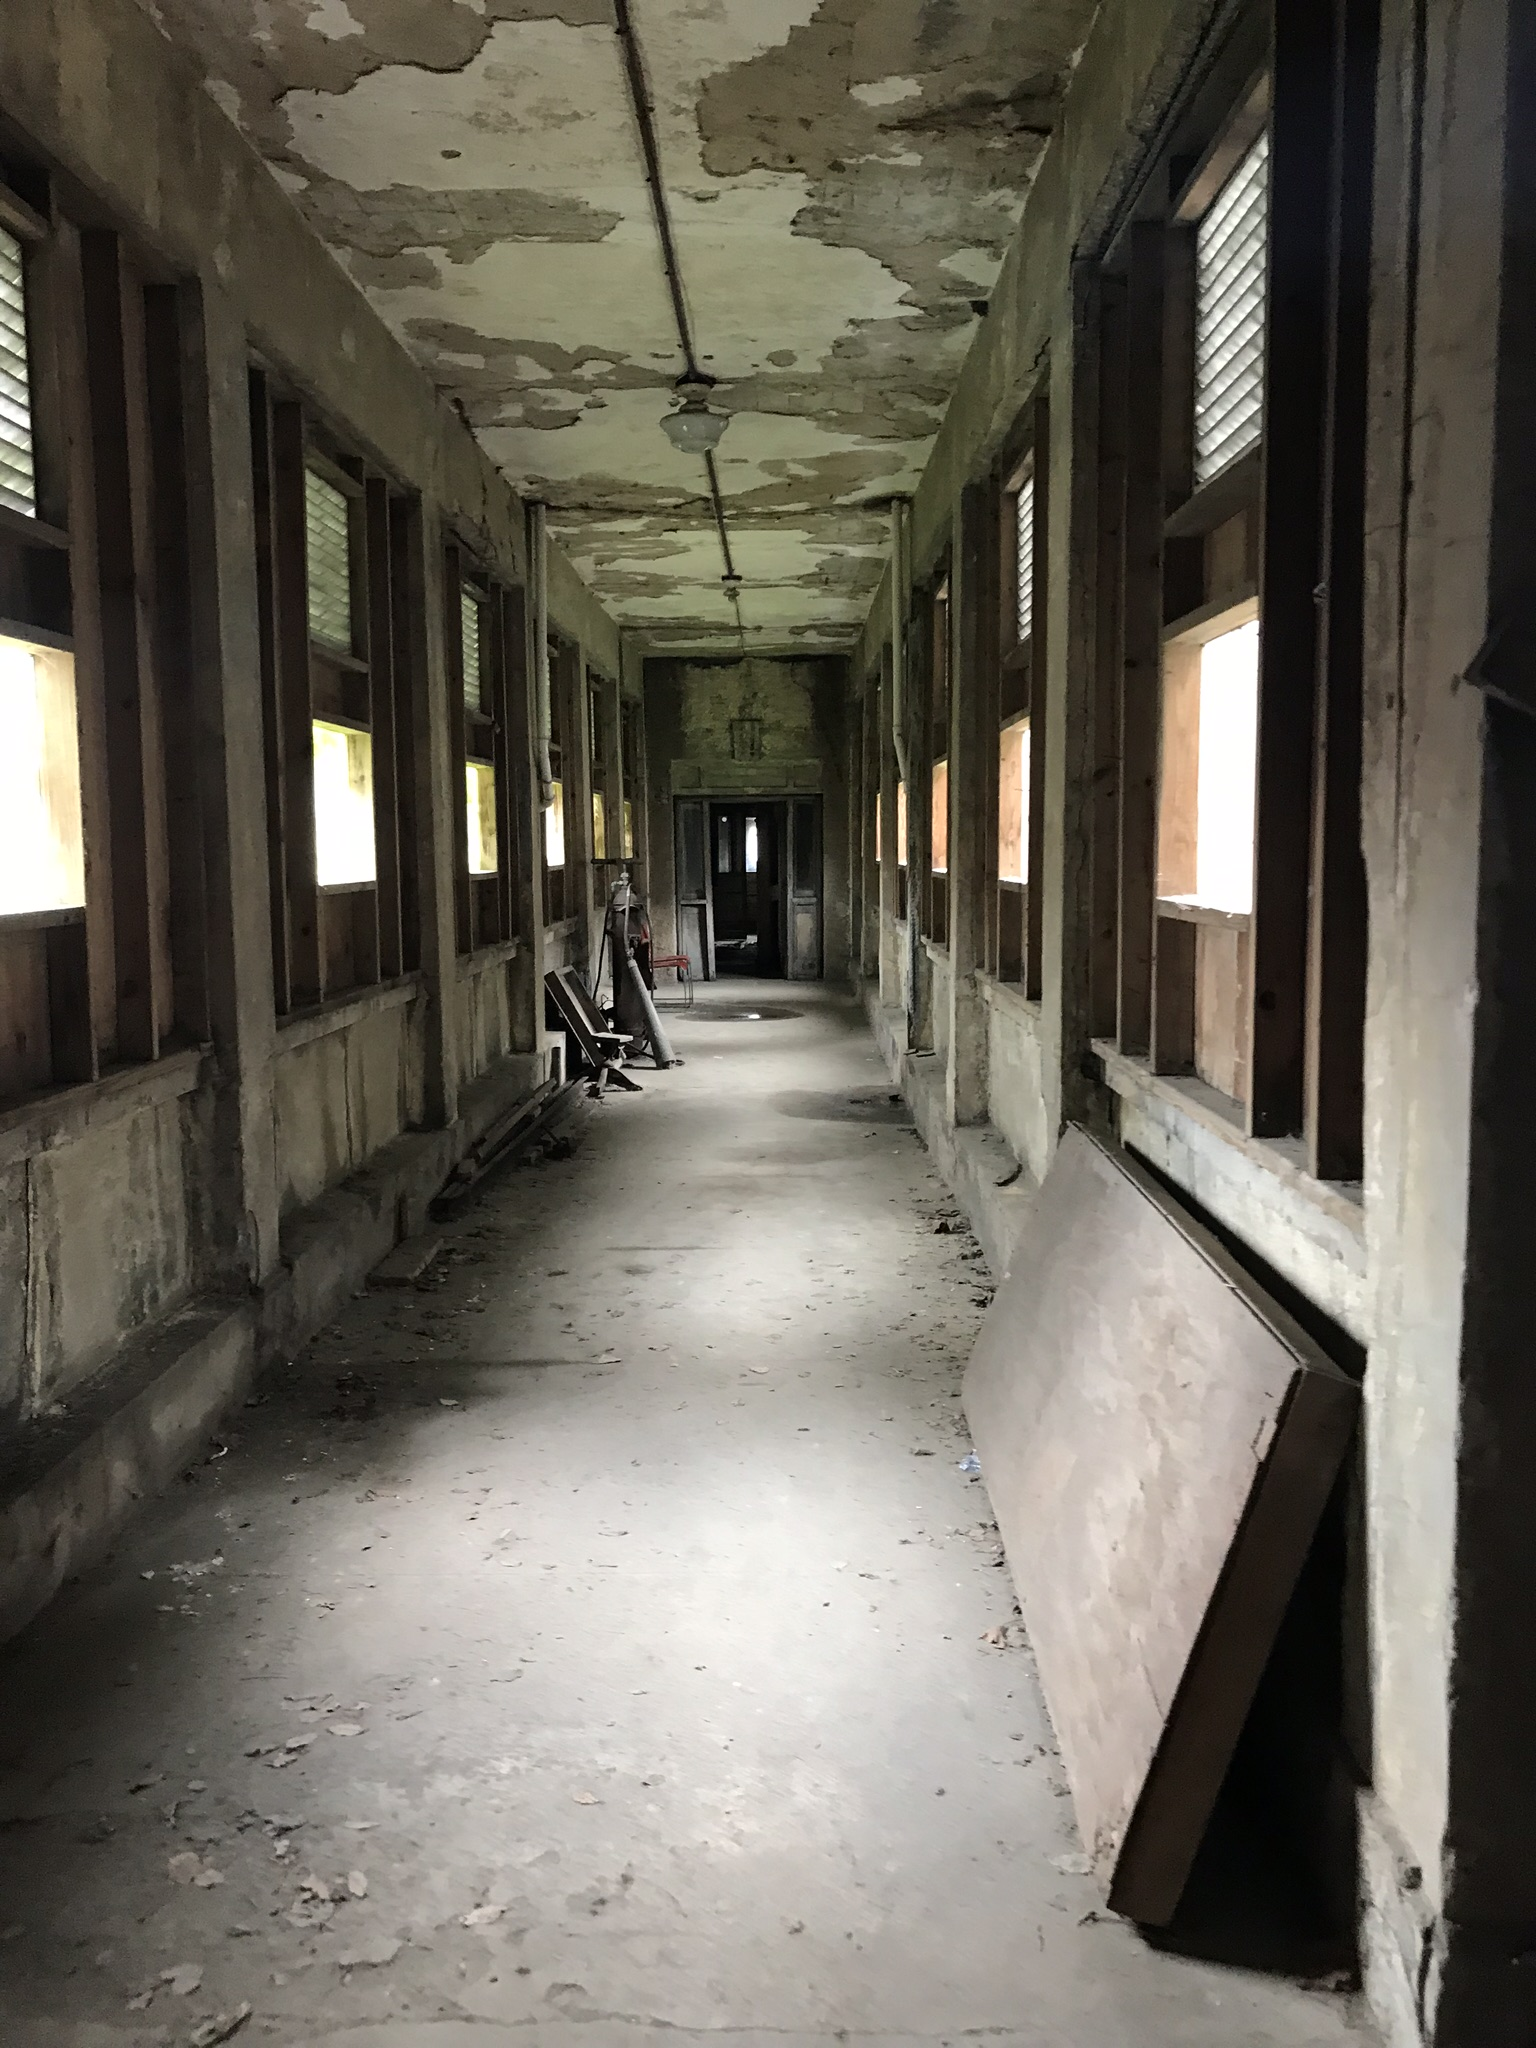 Hallway on second floor.